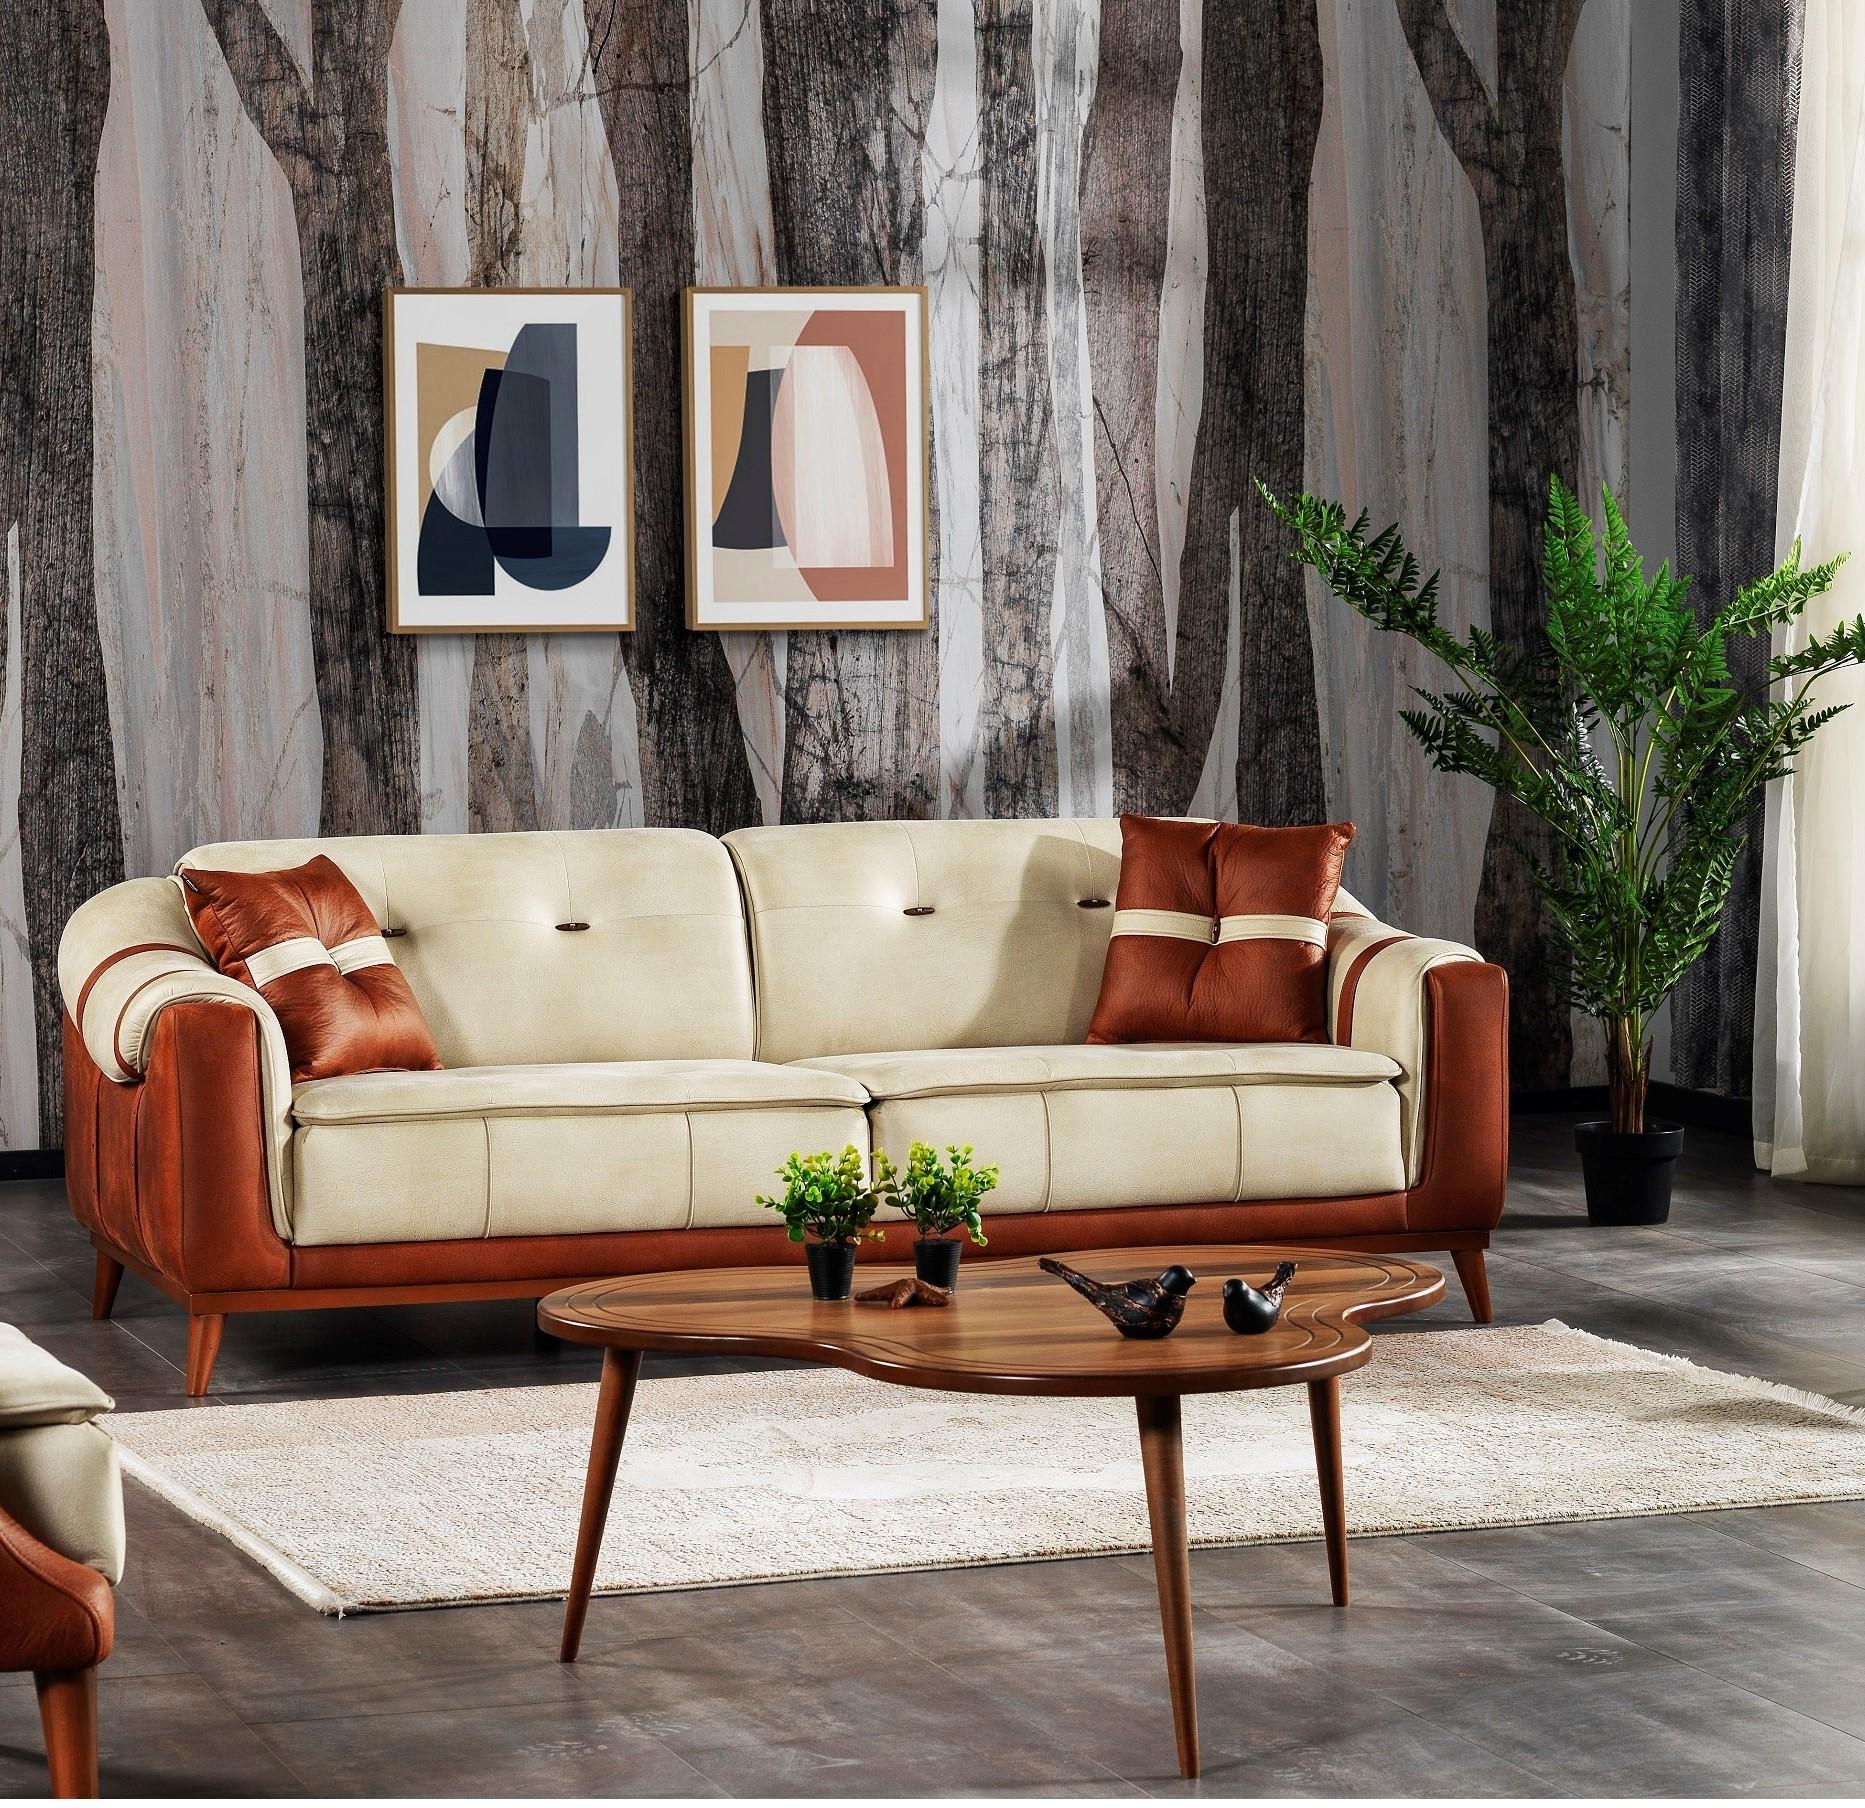 Canapea tapitata cu stofa, 3 locuri, cu functie sleep pentru 1 persoana Urla Crem / Maro K1, l227xA100xH80 cm somproduct.ro